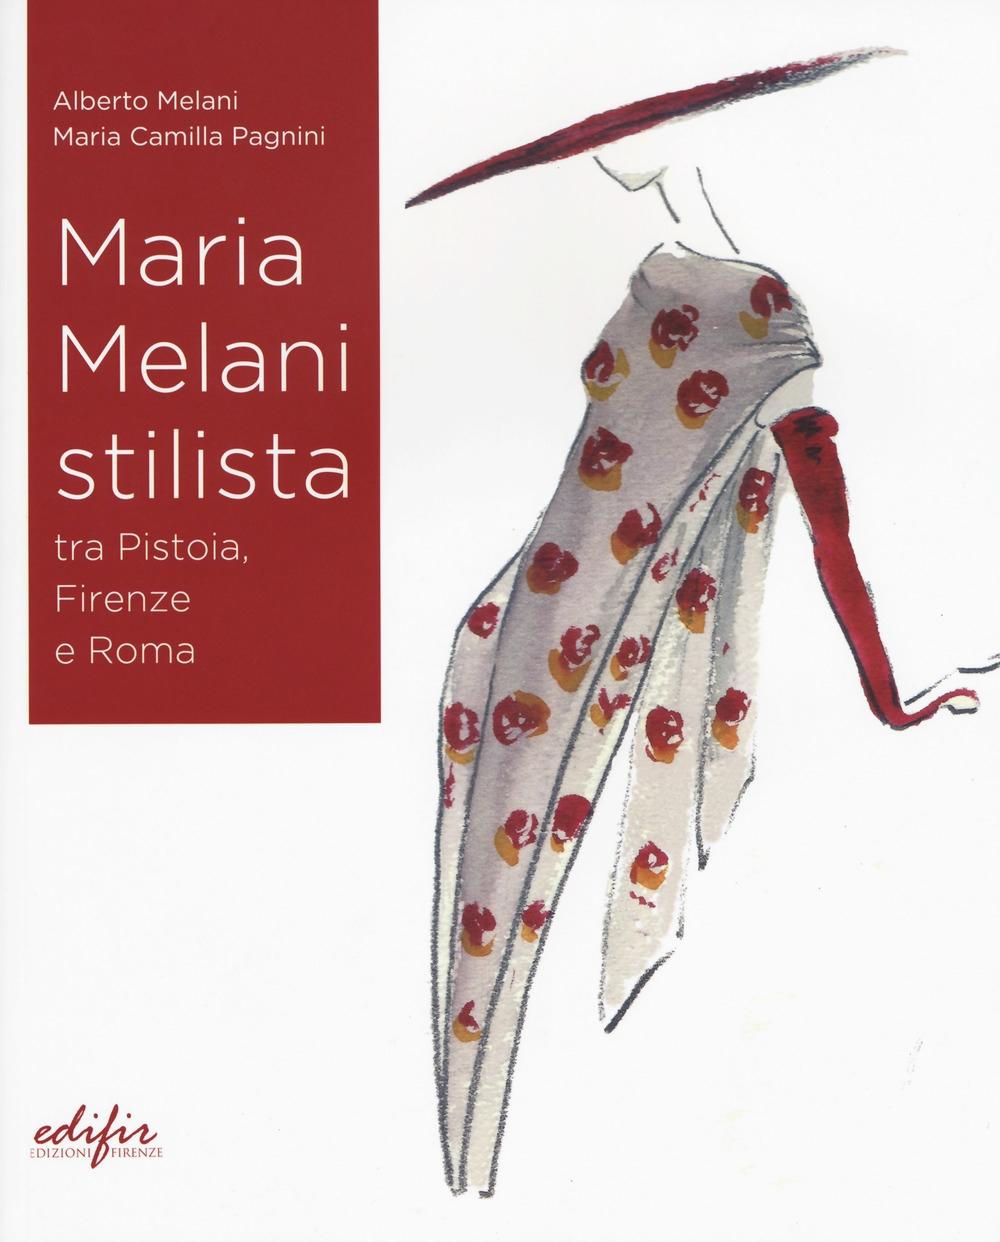 Maria Melani stilista fra Pistoia, Firenze e Roma